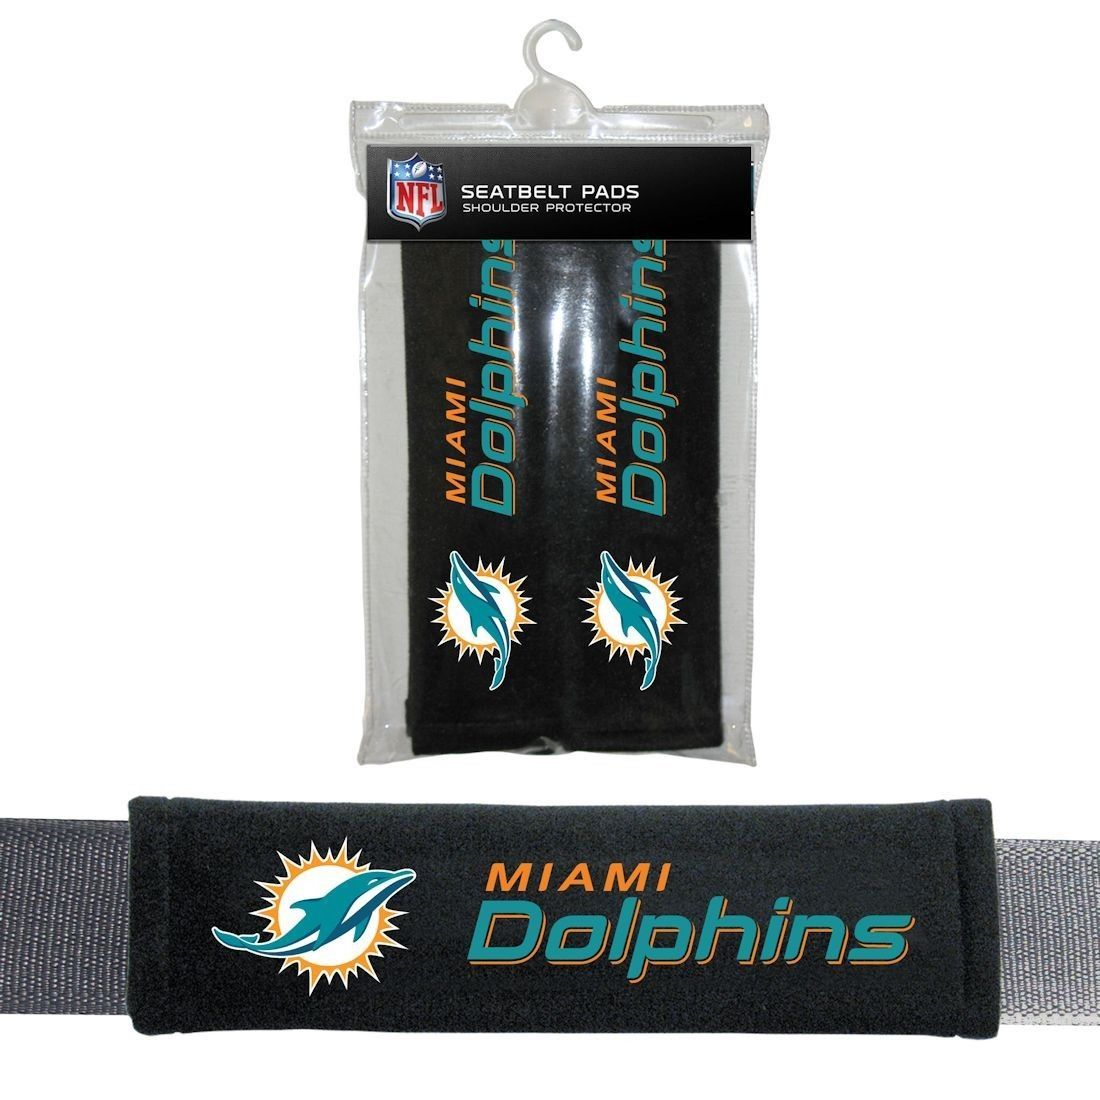 MIAMI DOLPHINS 2 VELOUR SEAT BELT LAPTOP GYM BAG SHOULDER PADS NFL FOOTBALL